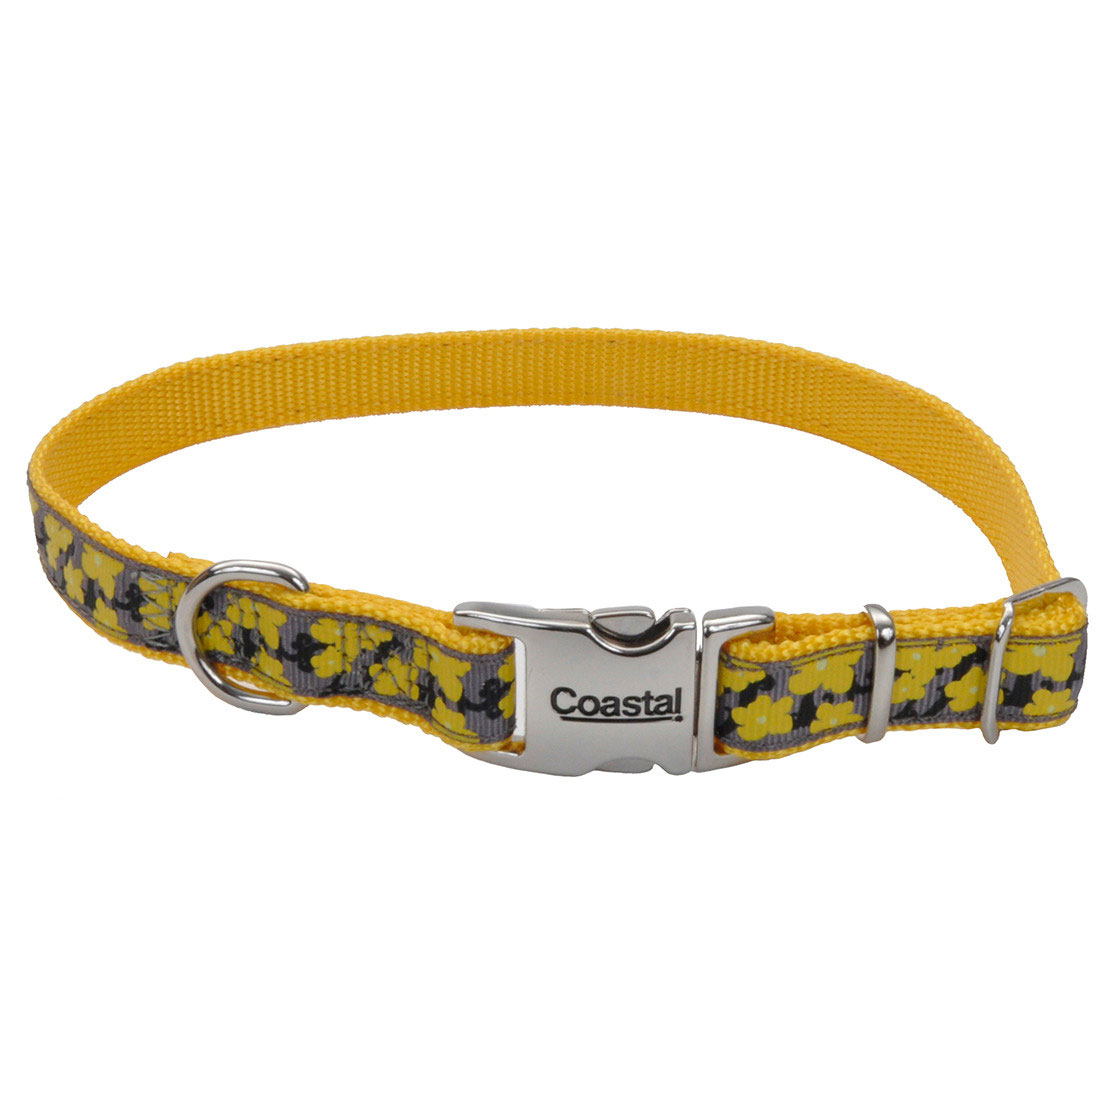 Coastal Ribbon Dog Leash, Navy Blue Plaid, 1-in x 6-ft